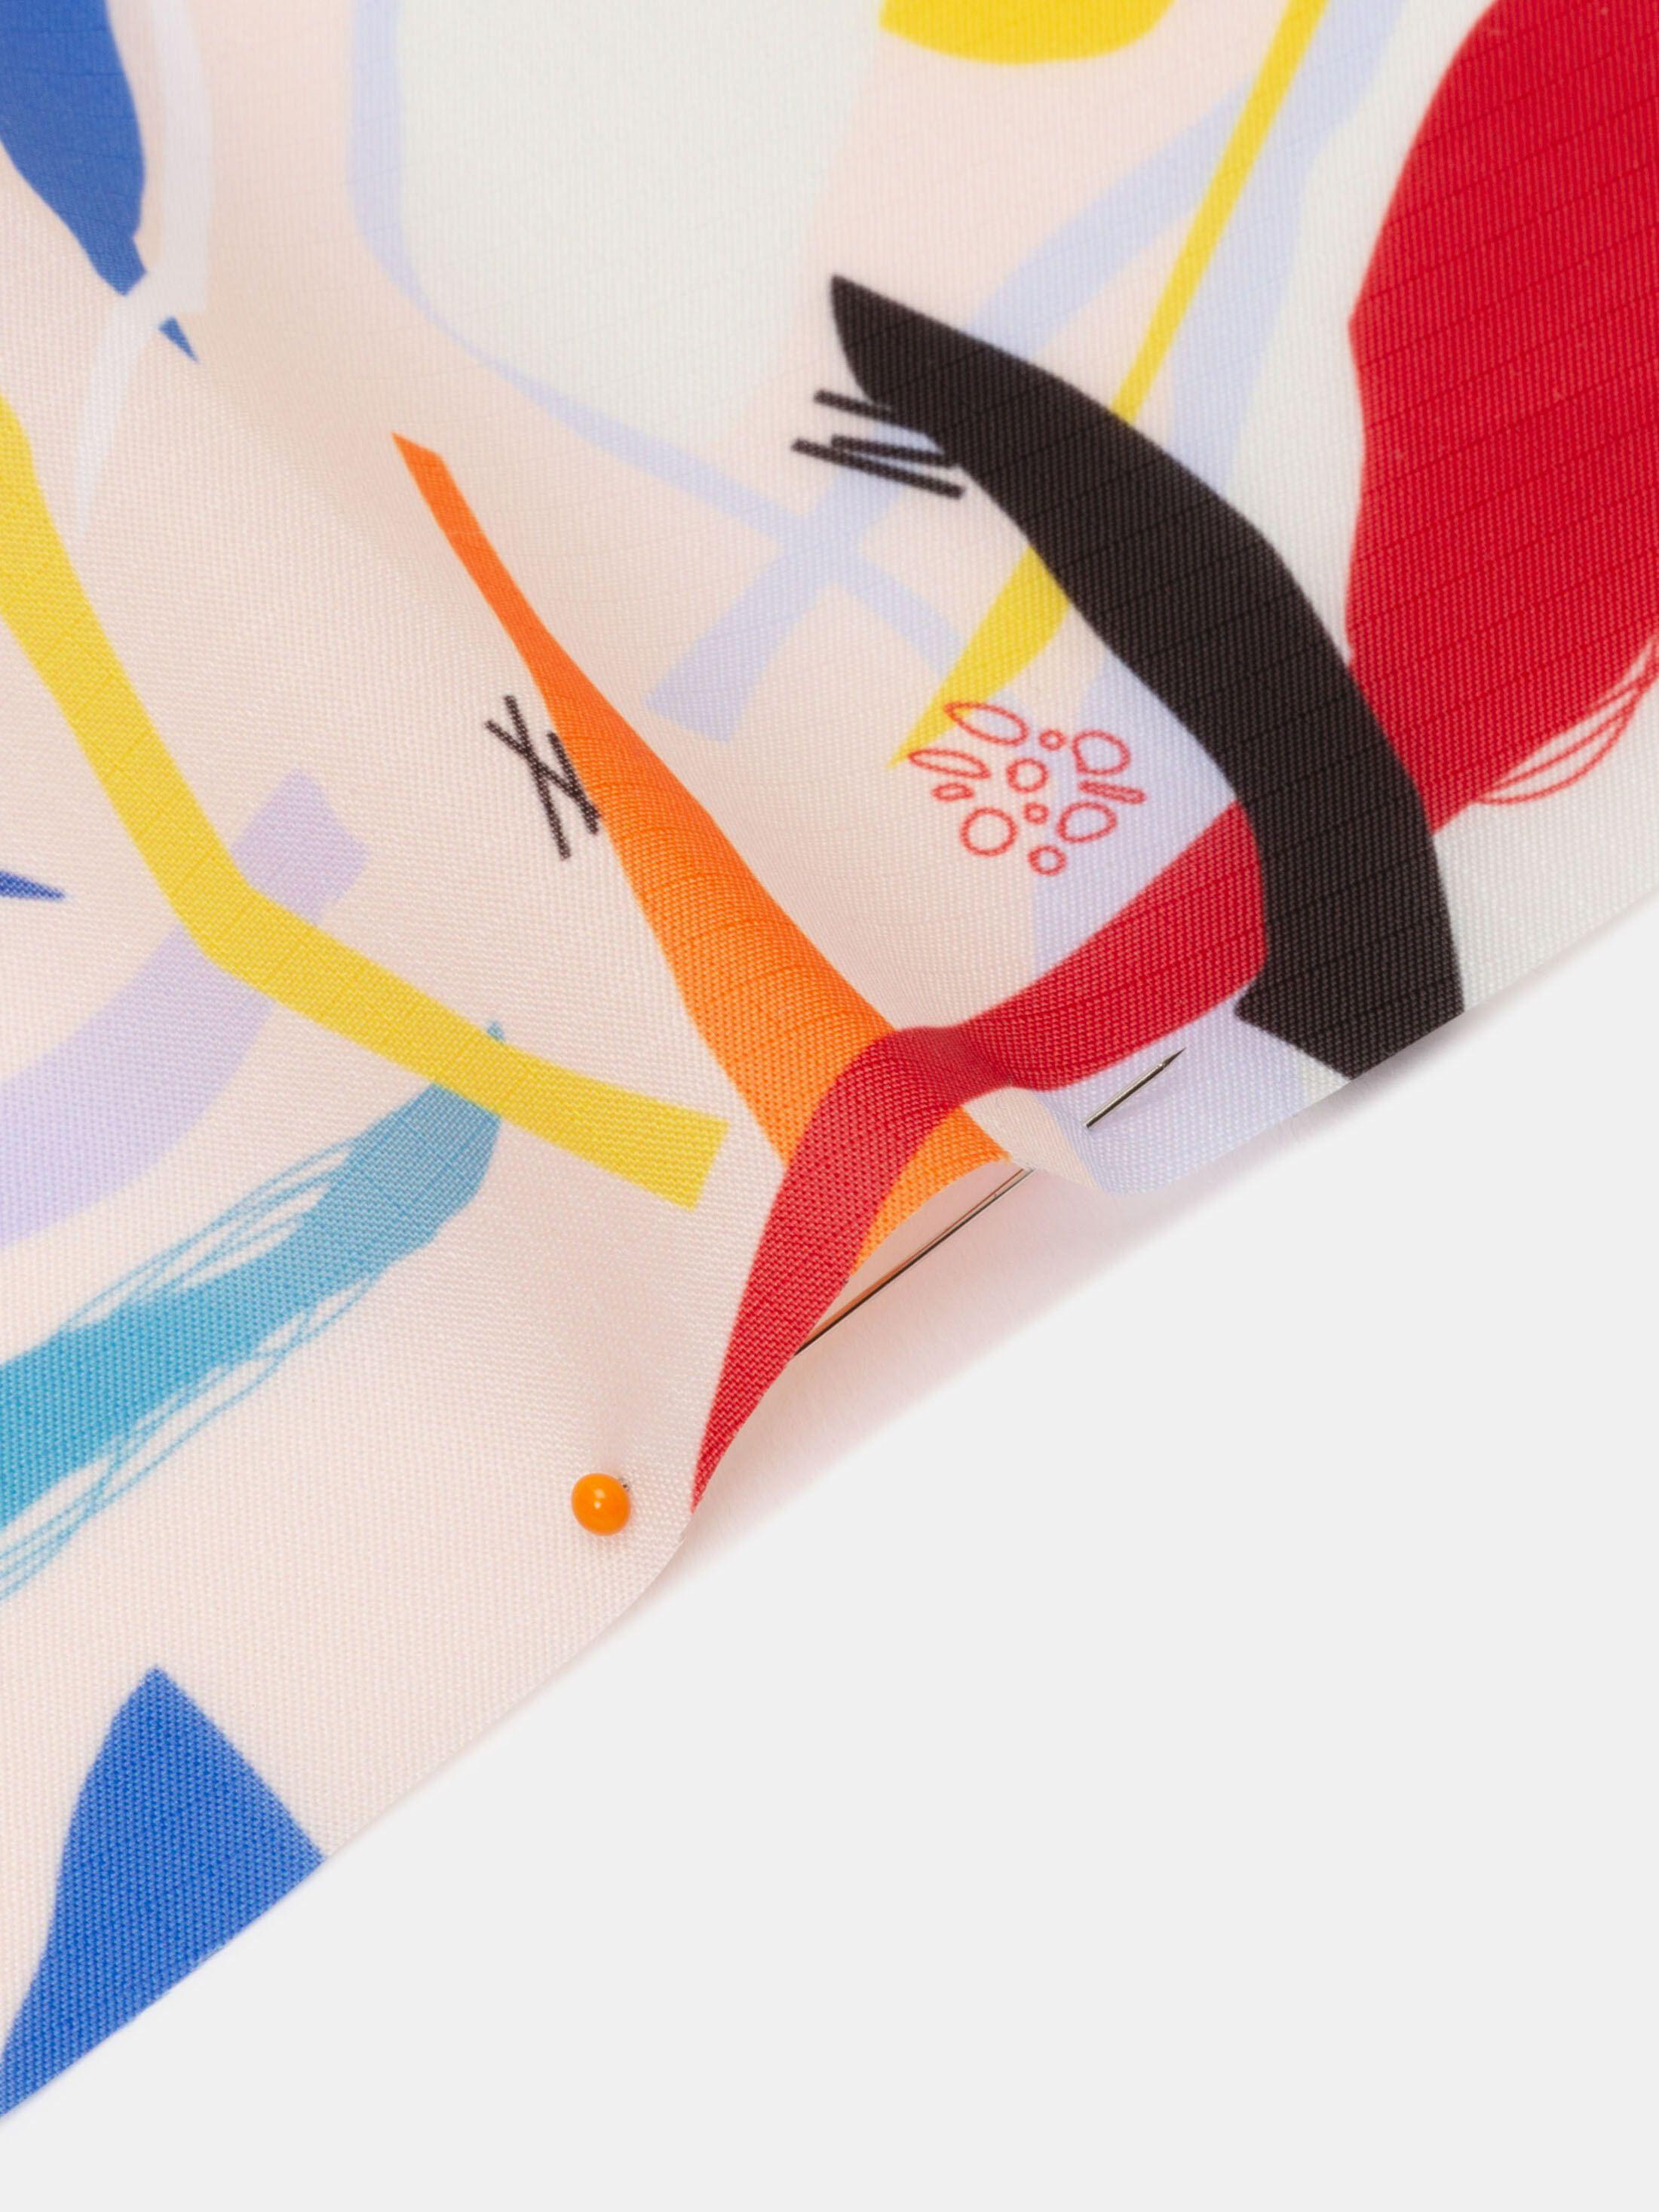 print Ripstop lightweight waterproof fabric edge options